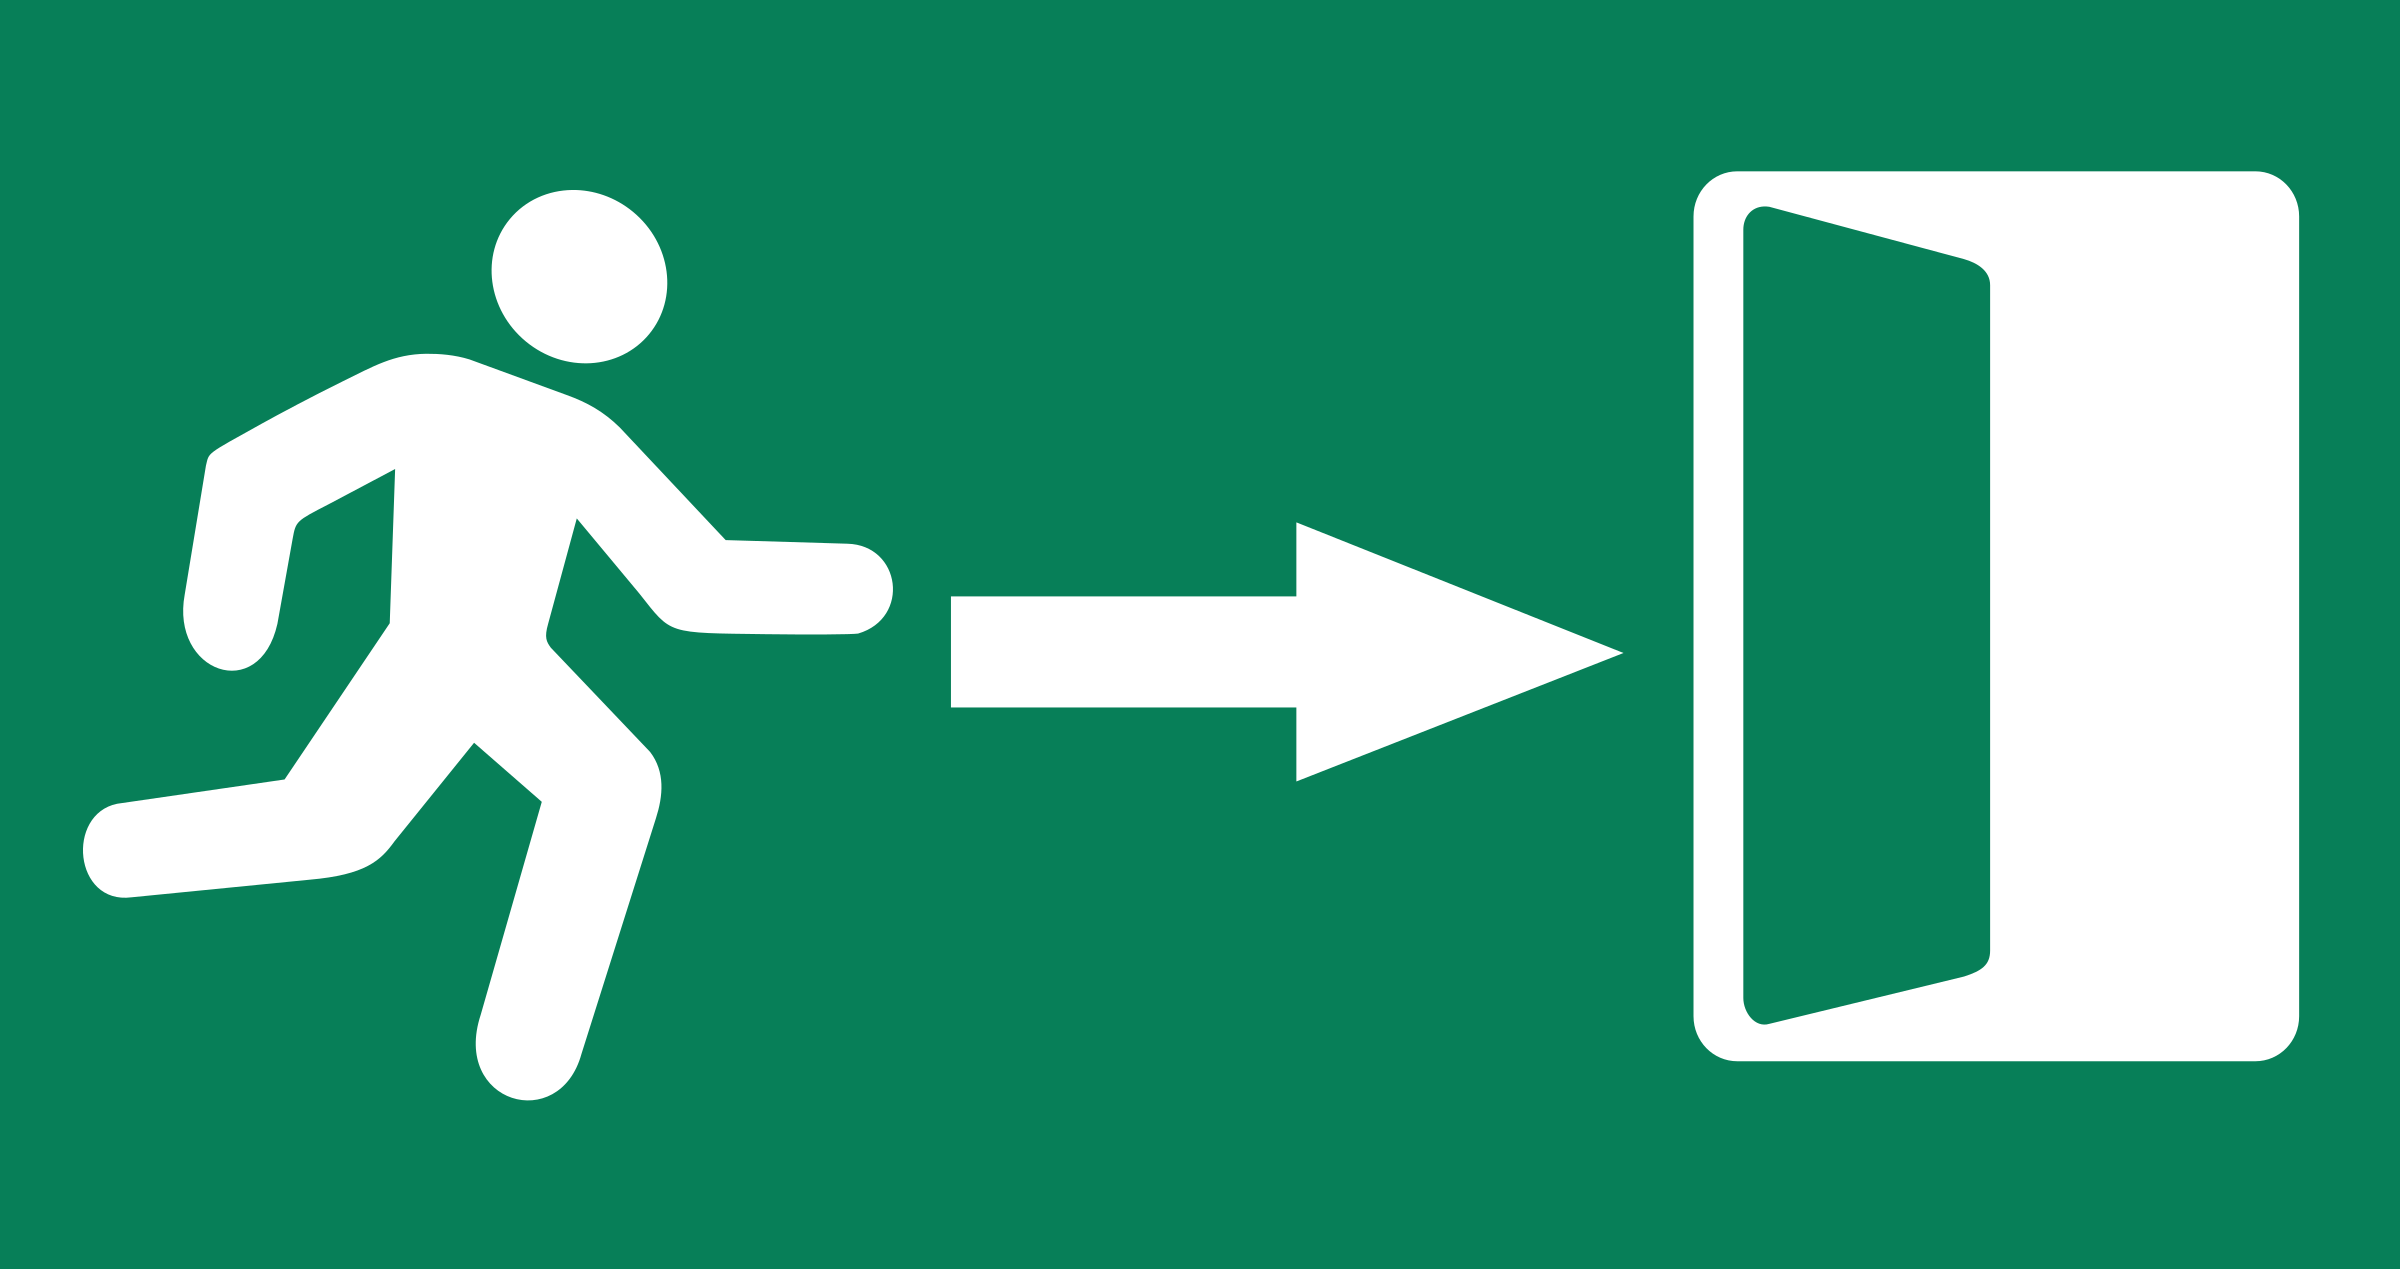 clipart exit sign Exit Sign Clip Art Black and White Exit Sign Clip Art Black and White